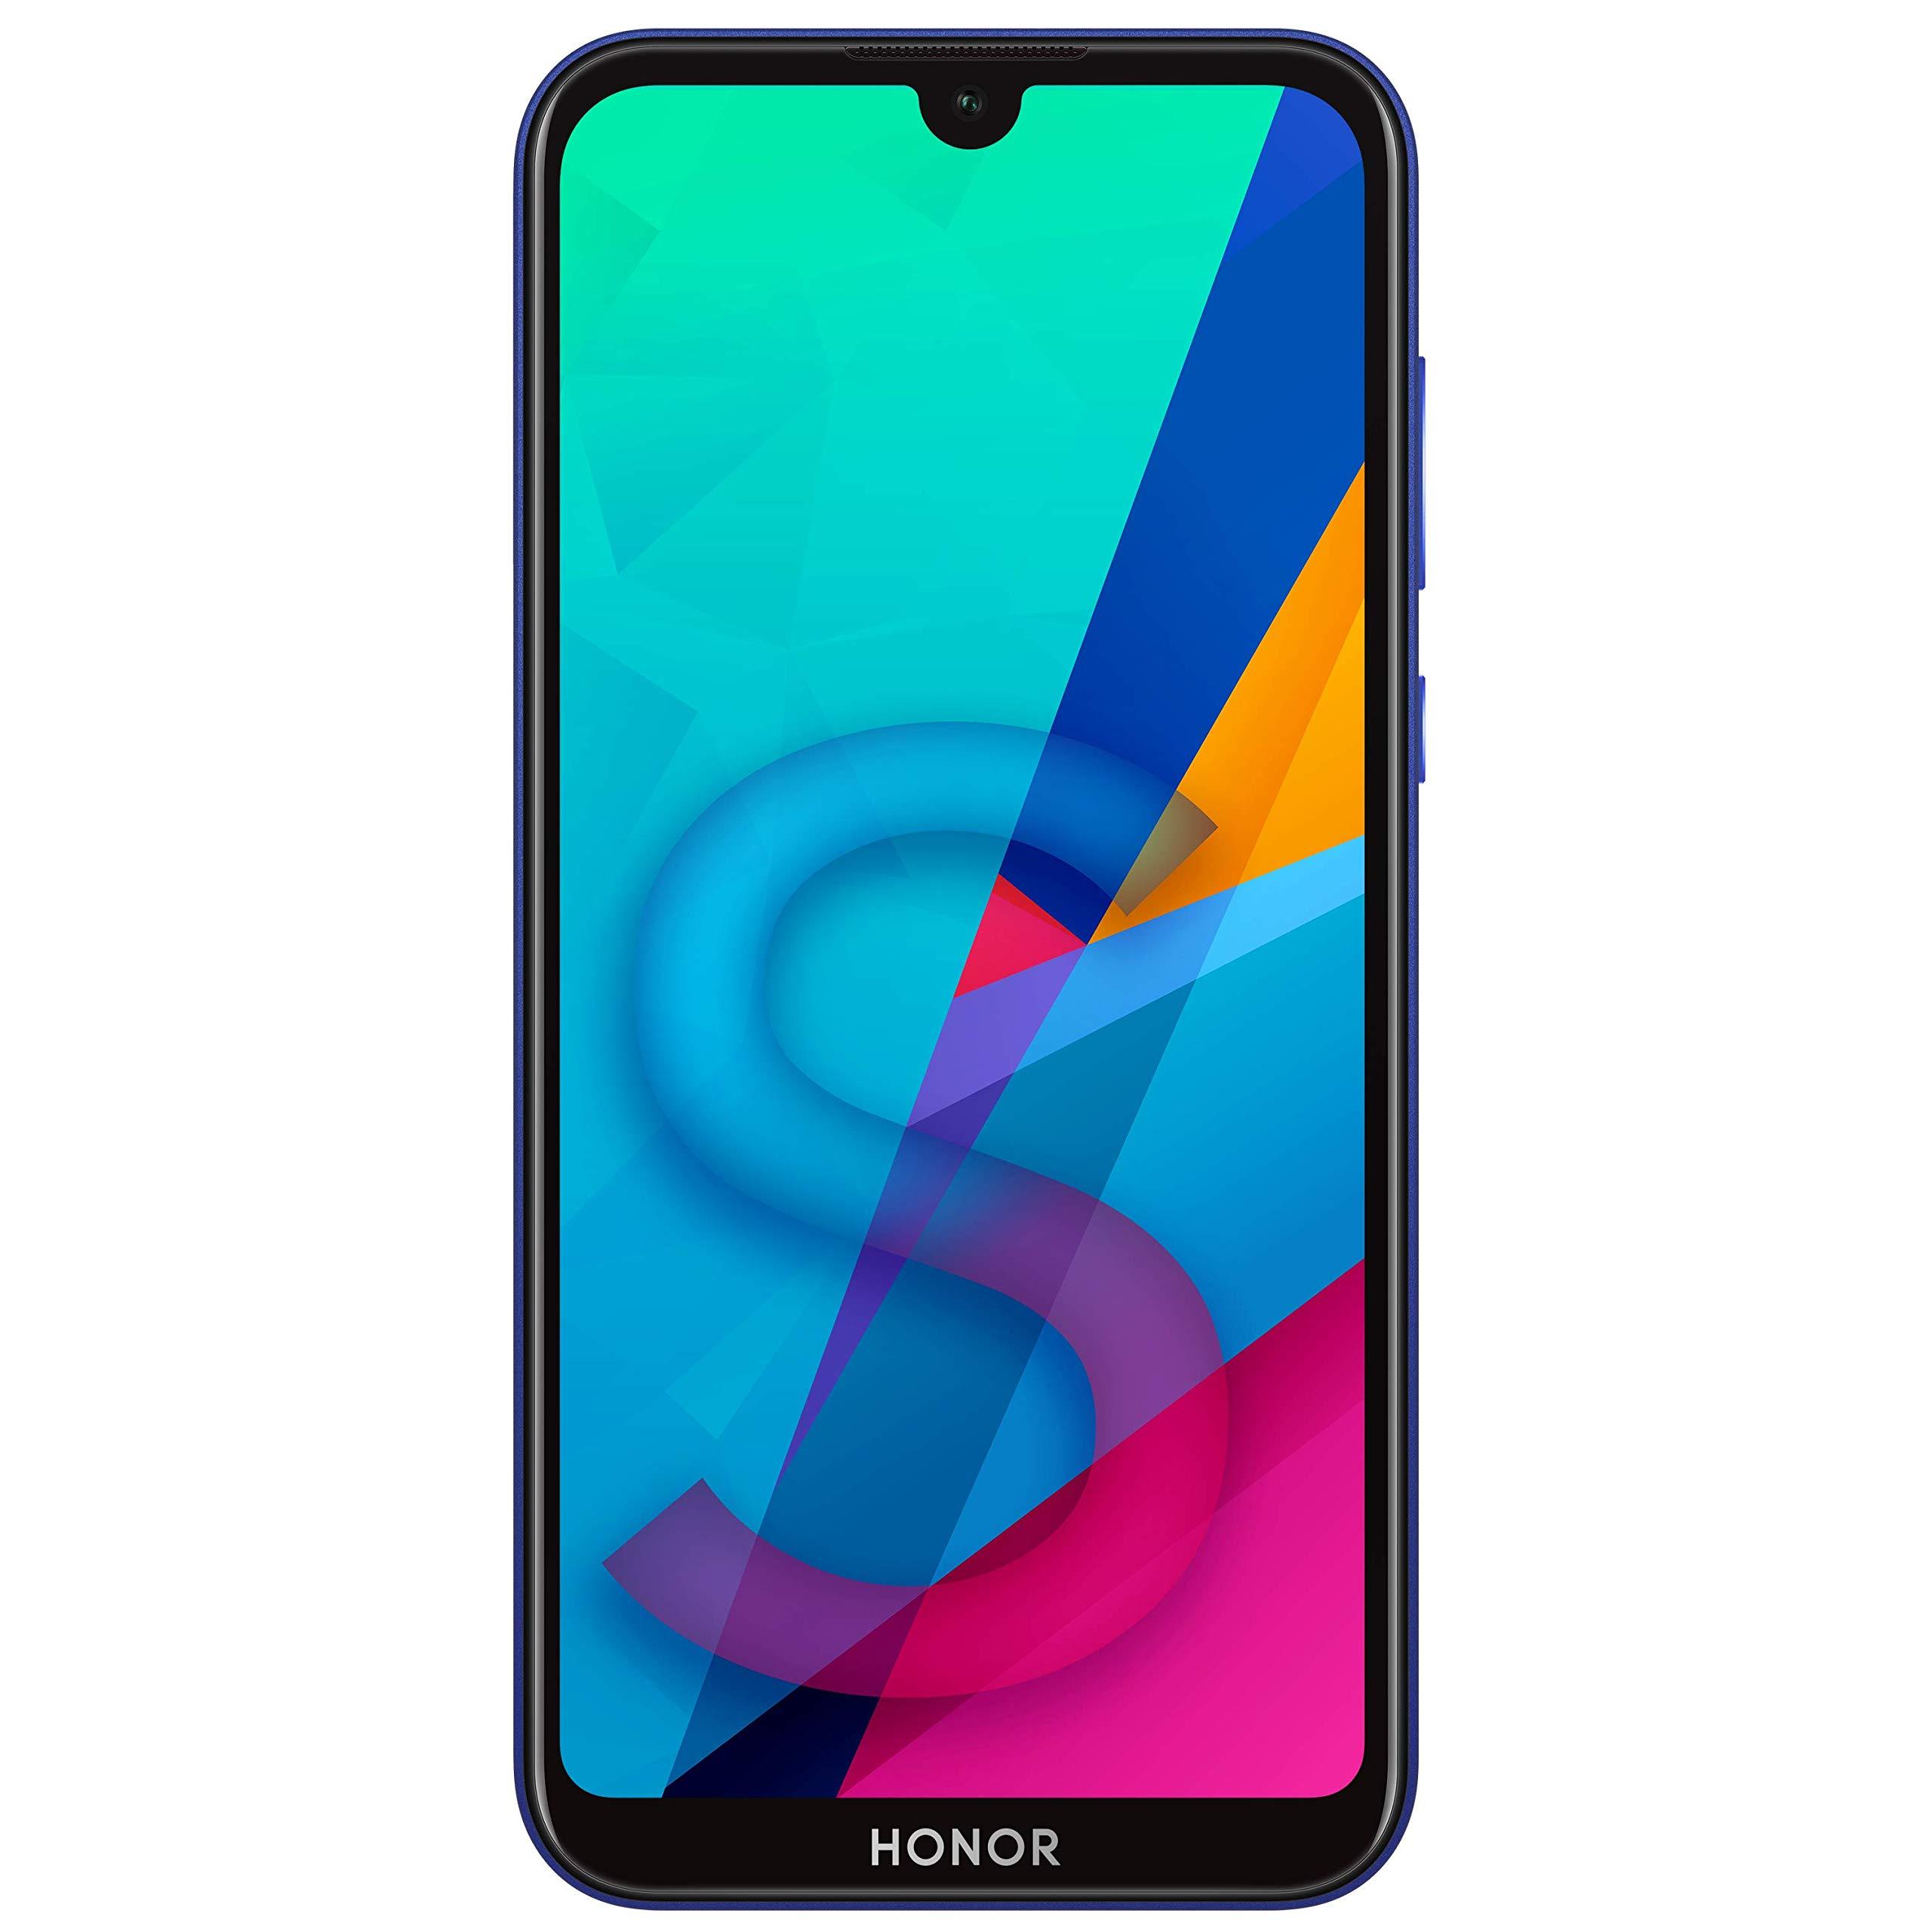 Honor 8S - Smartphone 32GB, 2GB RAM, Dual Sim, Blue: Amazon.es: Electrónica